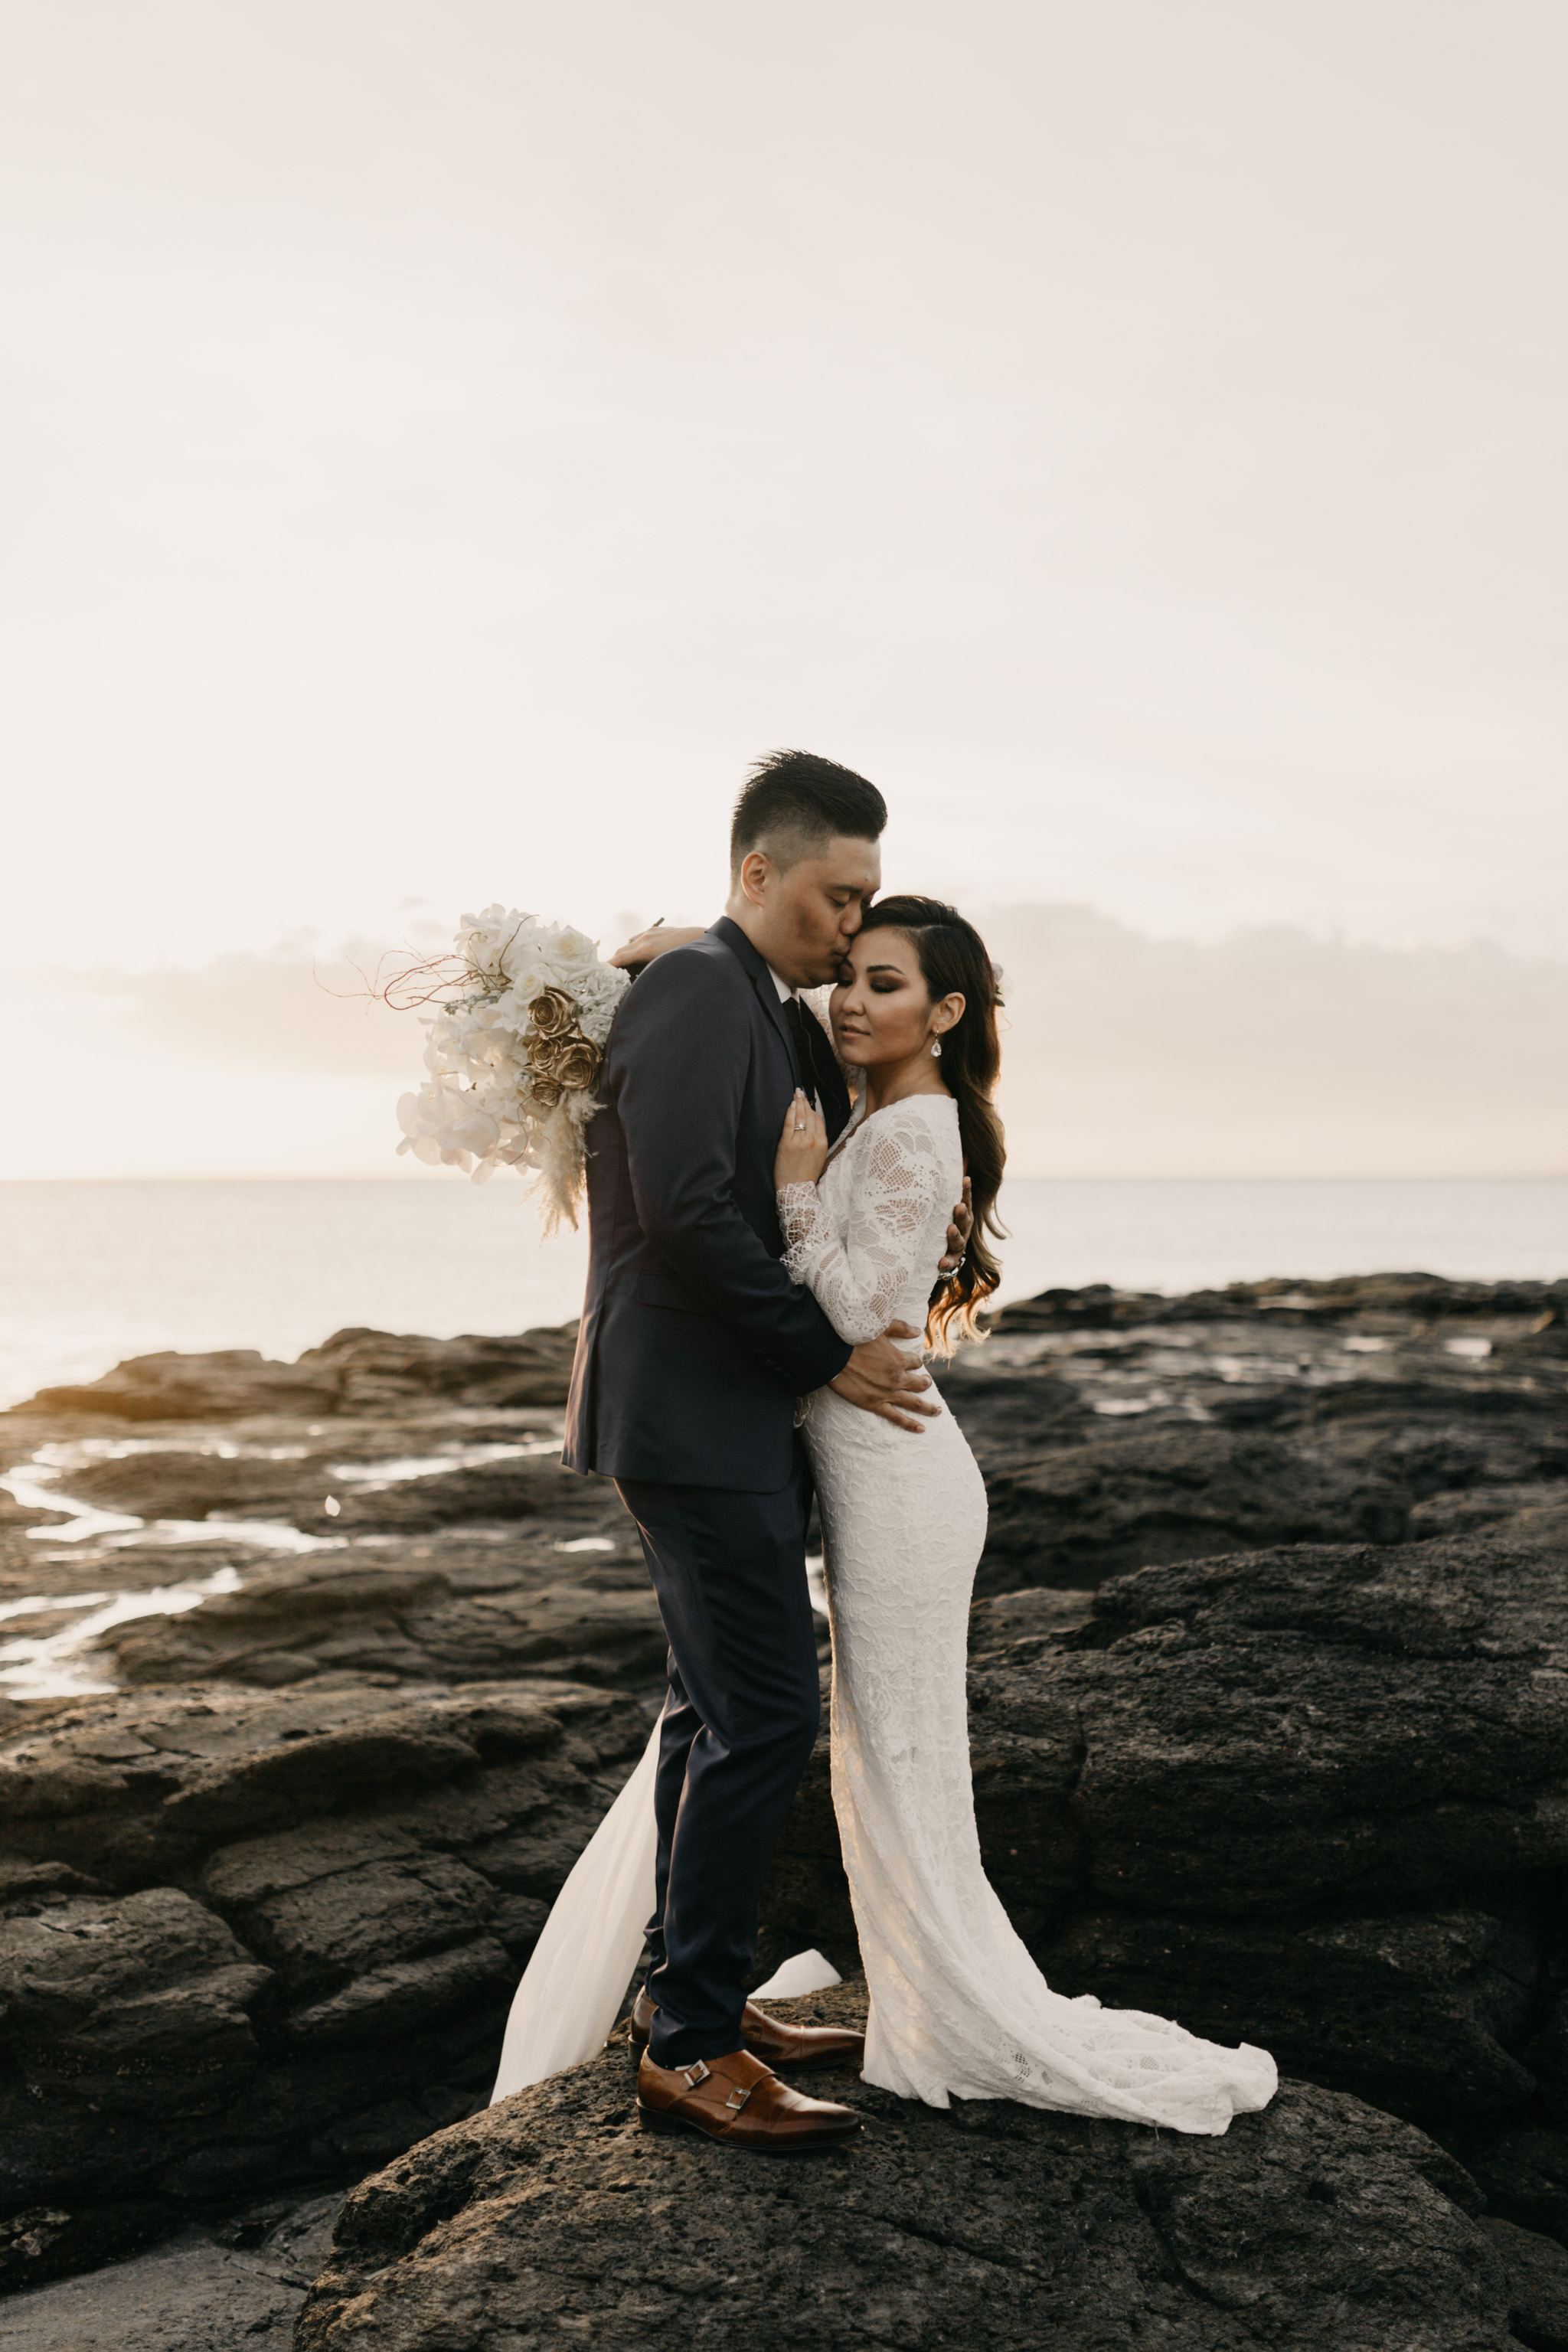 Grace Loves Lace Piper Wedding Gown   Merriman's Kapalua Maui wedding by Hawaii wedding photographer Desiree Leilani